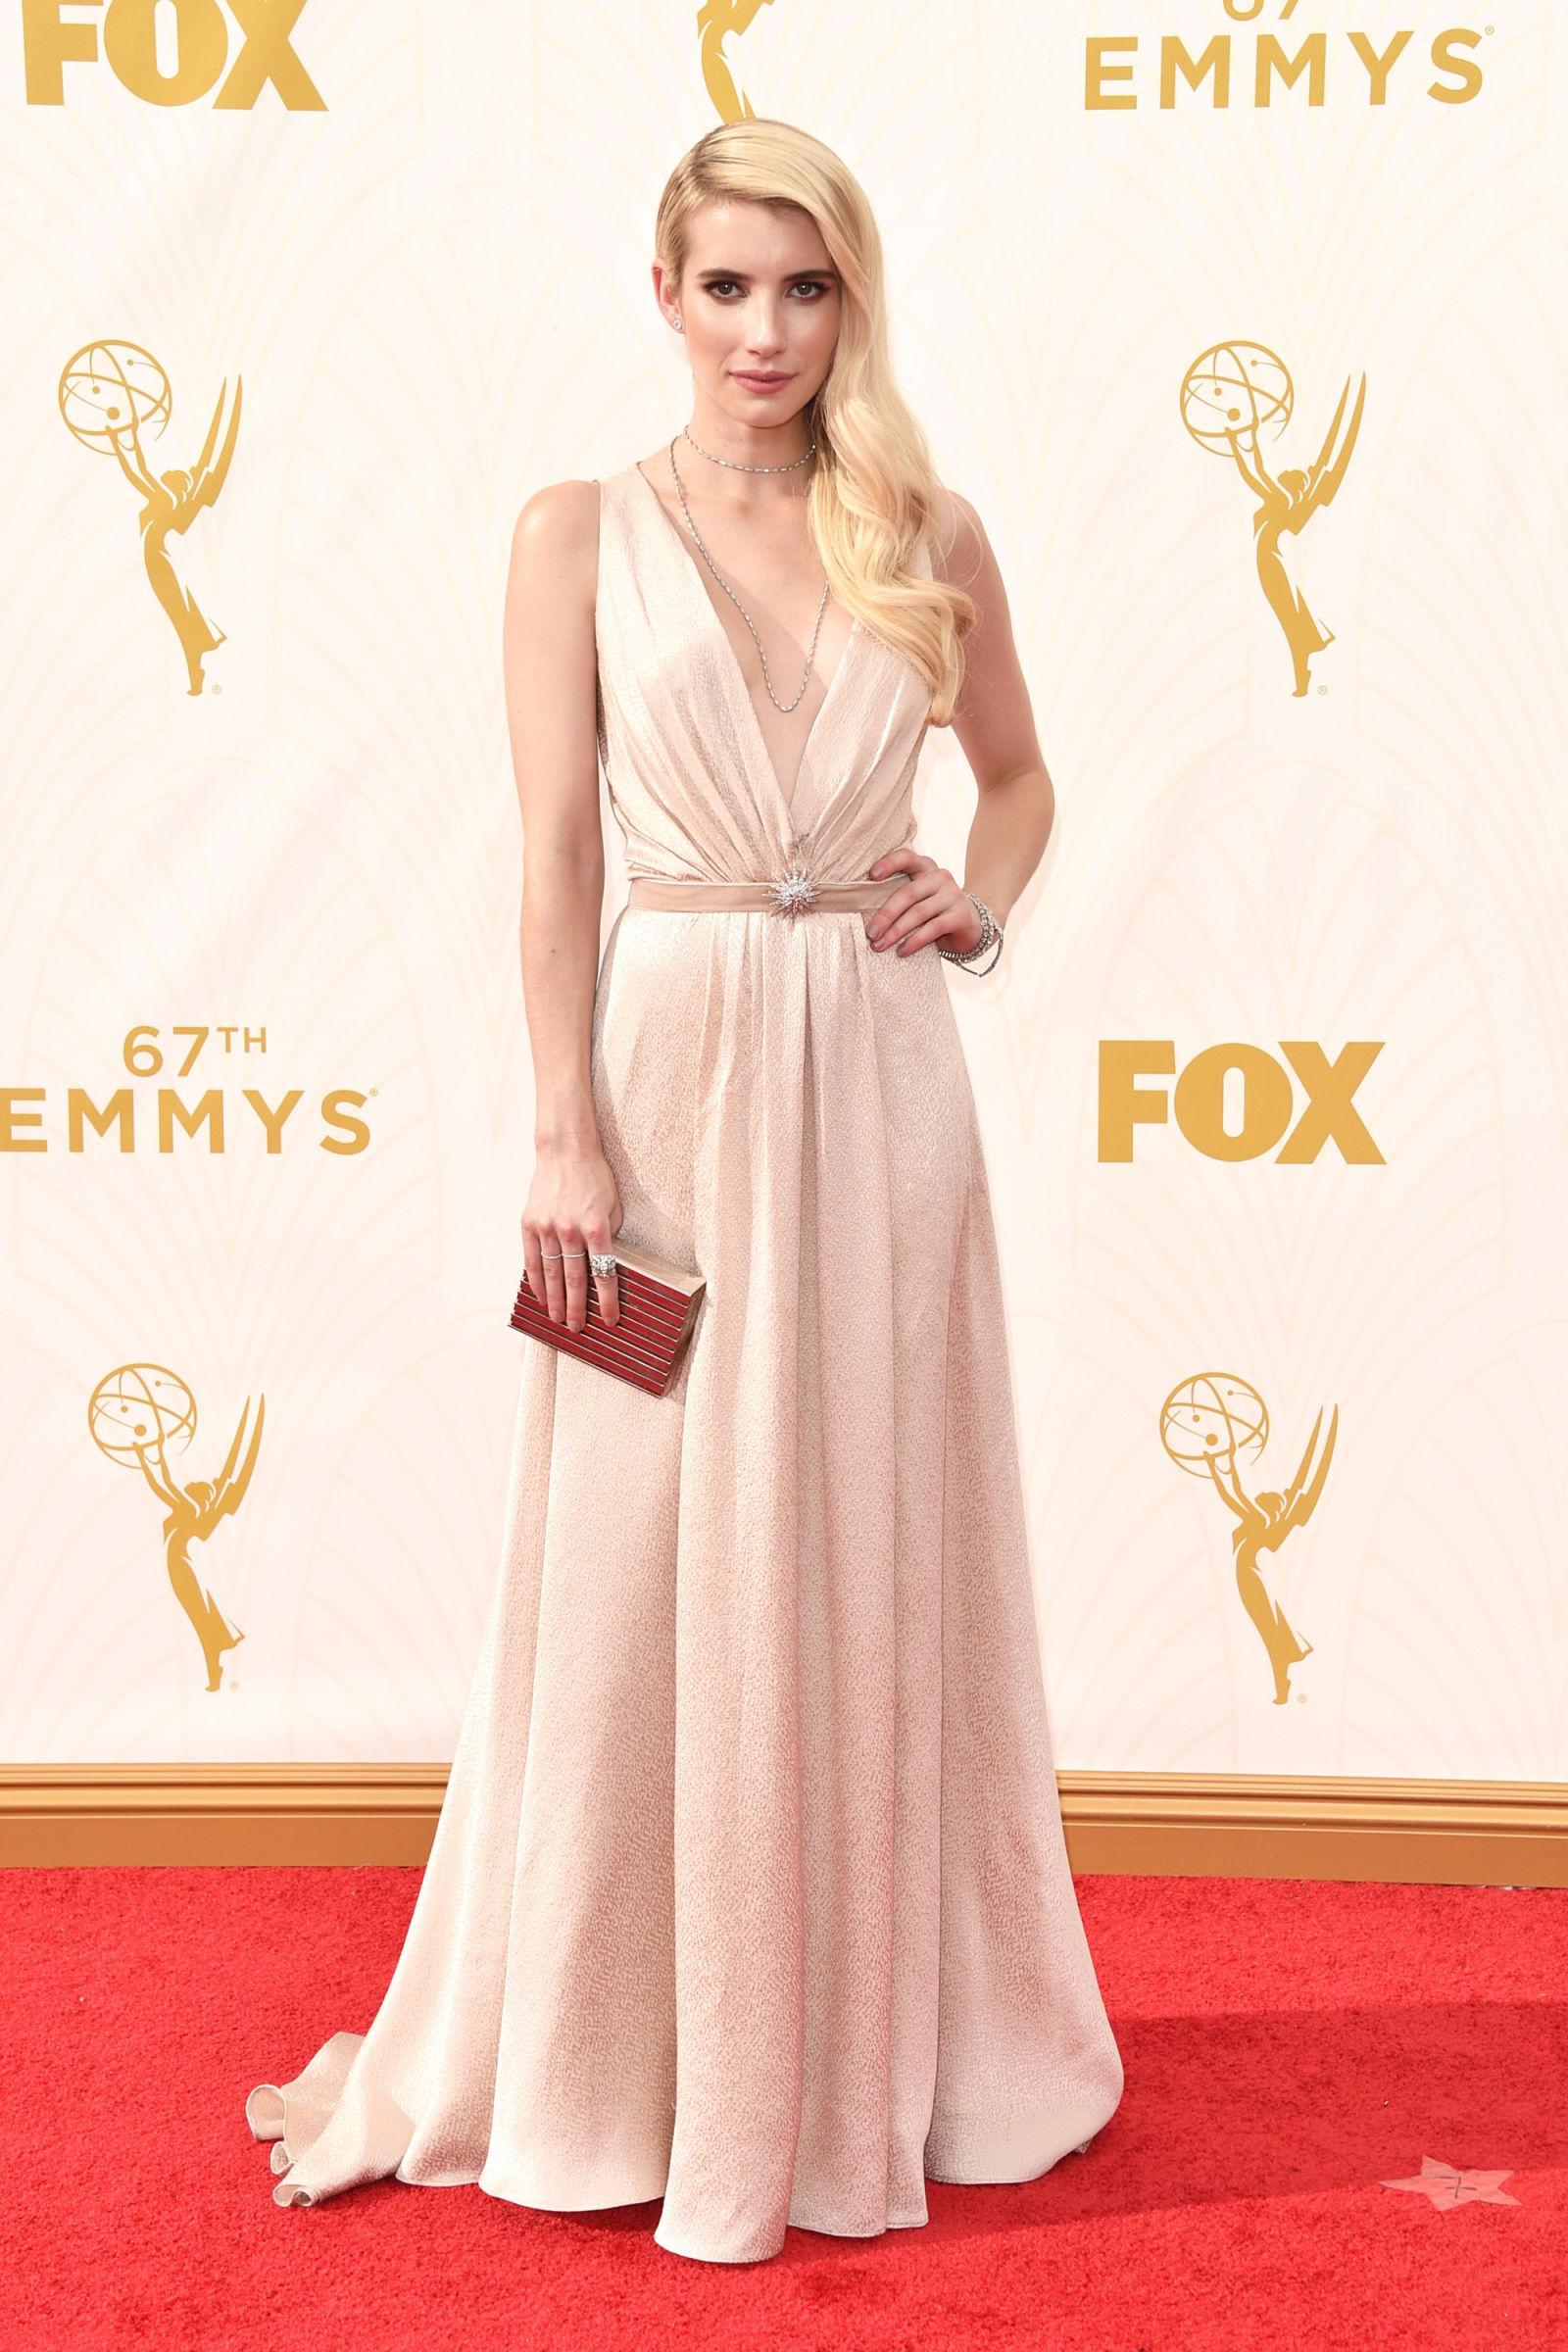 Emmys-2015-Emma-Roberts